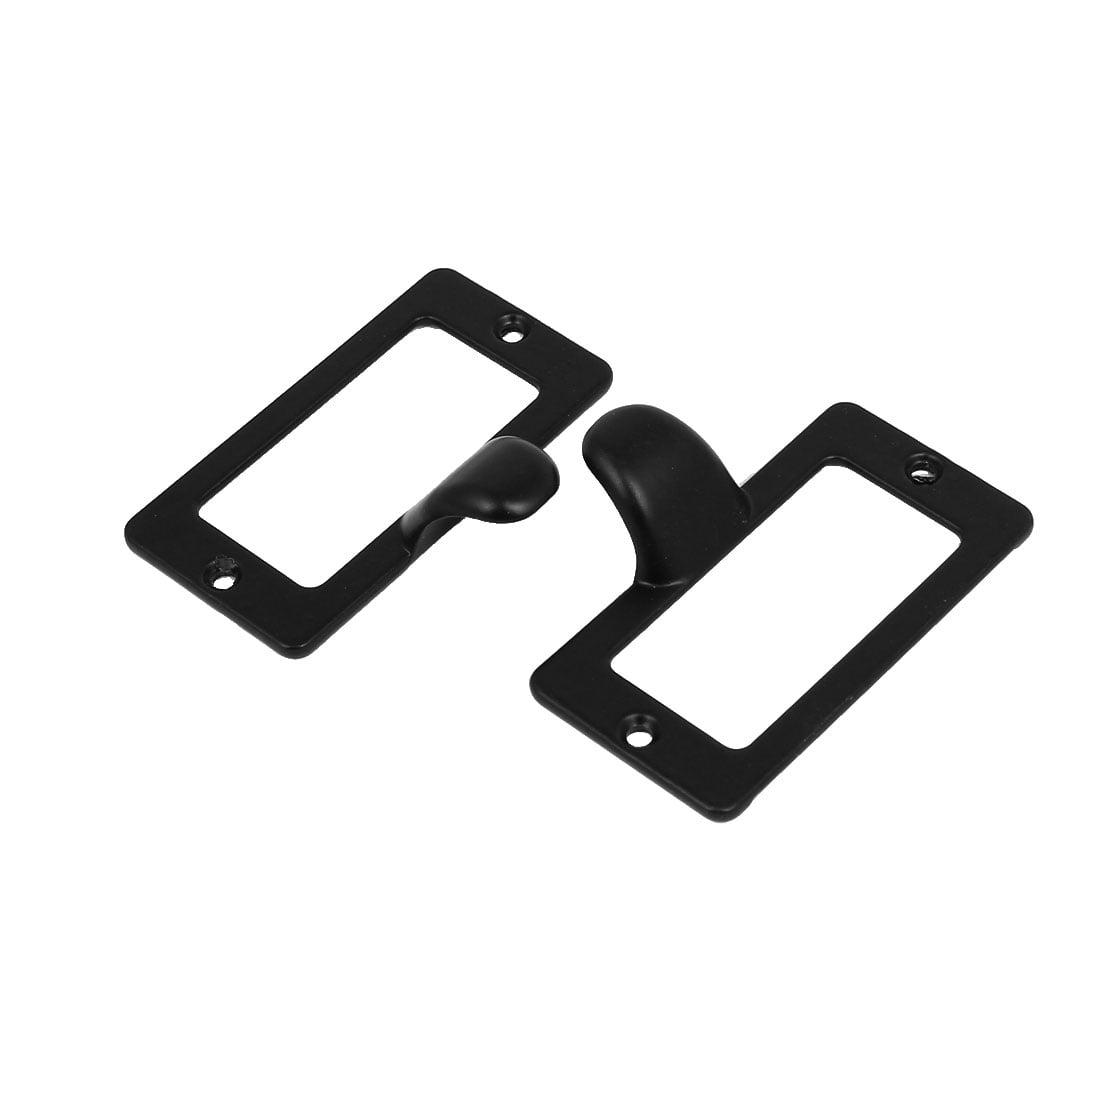 Office Cabinet Drawer Tag Frame Label Holder Pull Handles Black 59mm x 31mm 4PCS - image 3 of 4